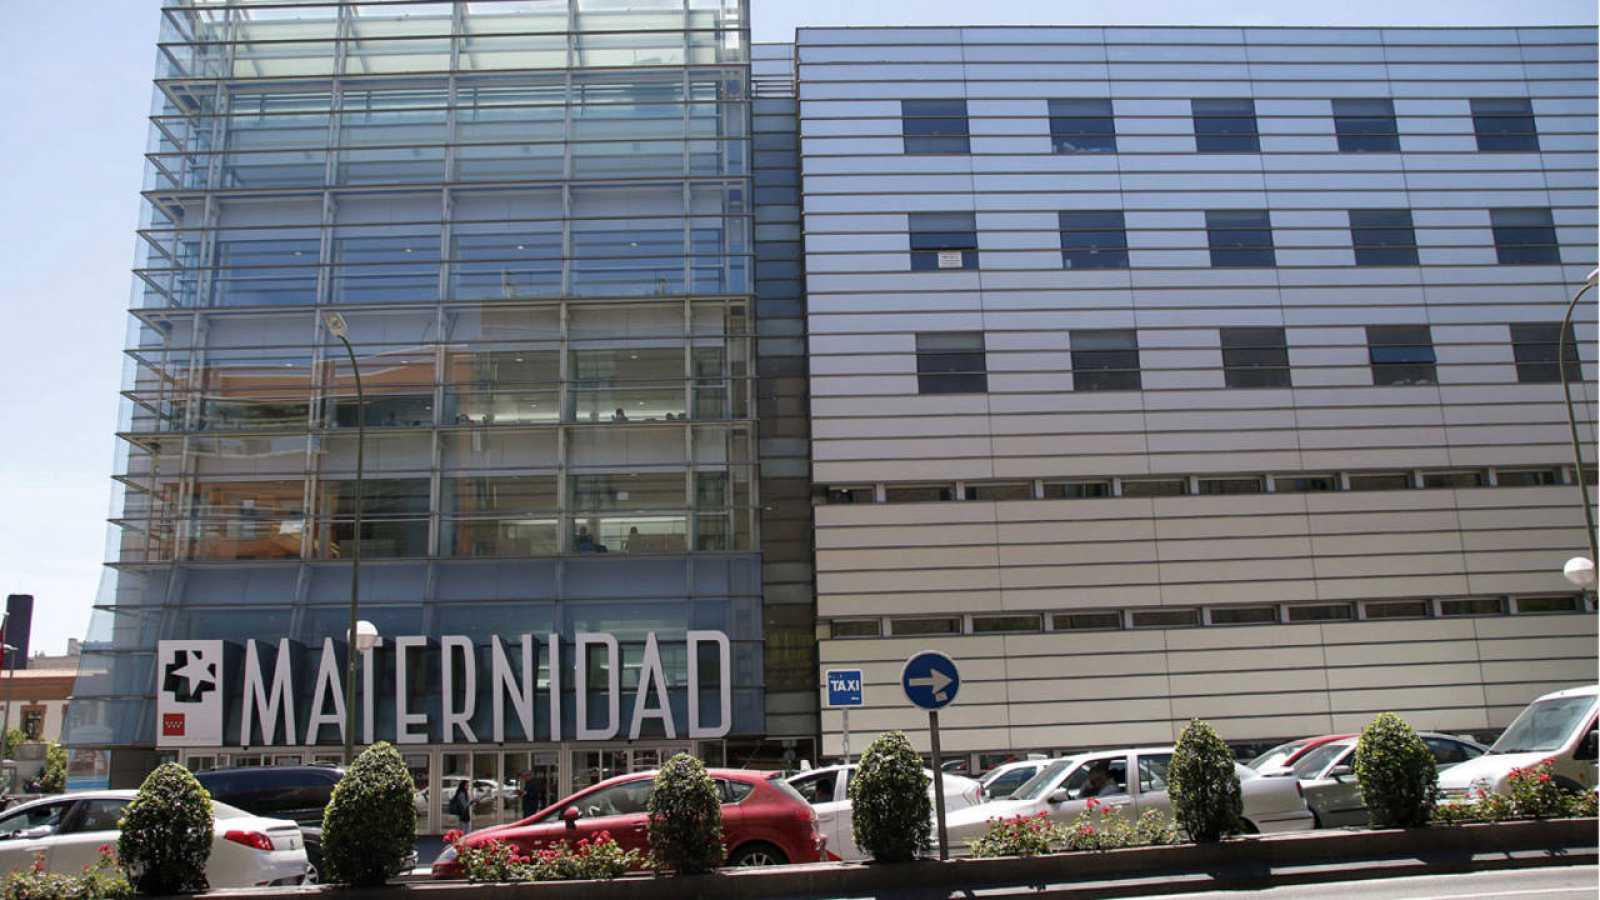 Fachada del Hospital Maternidad O'Donnell, en Madrid